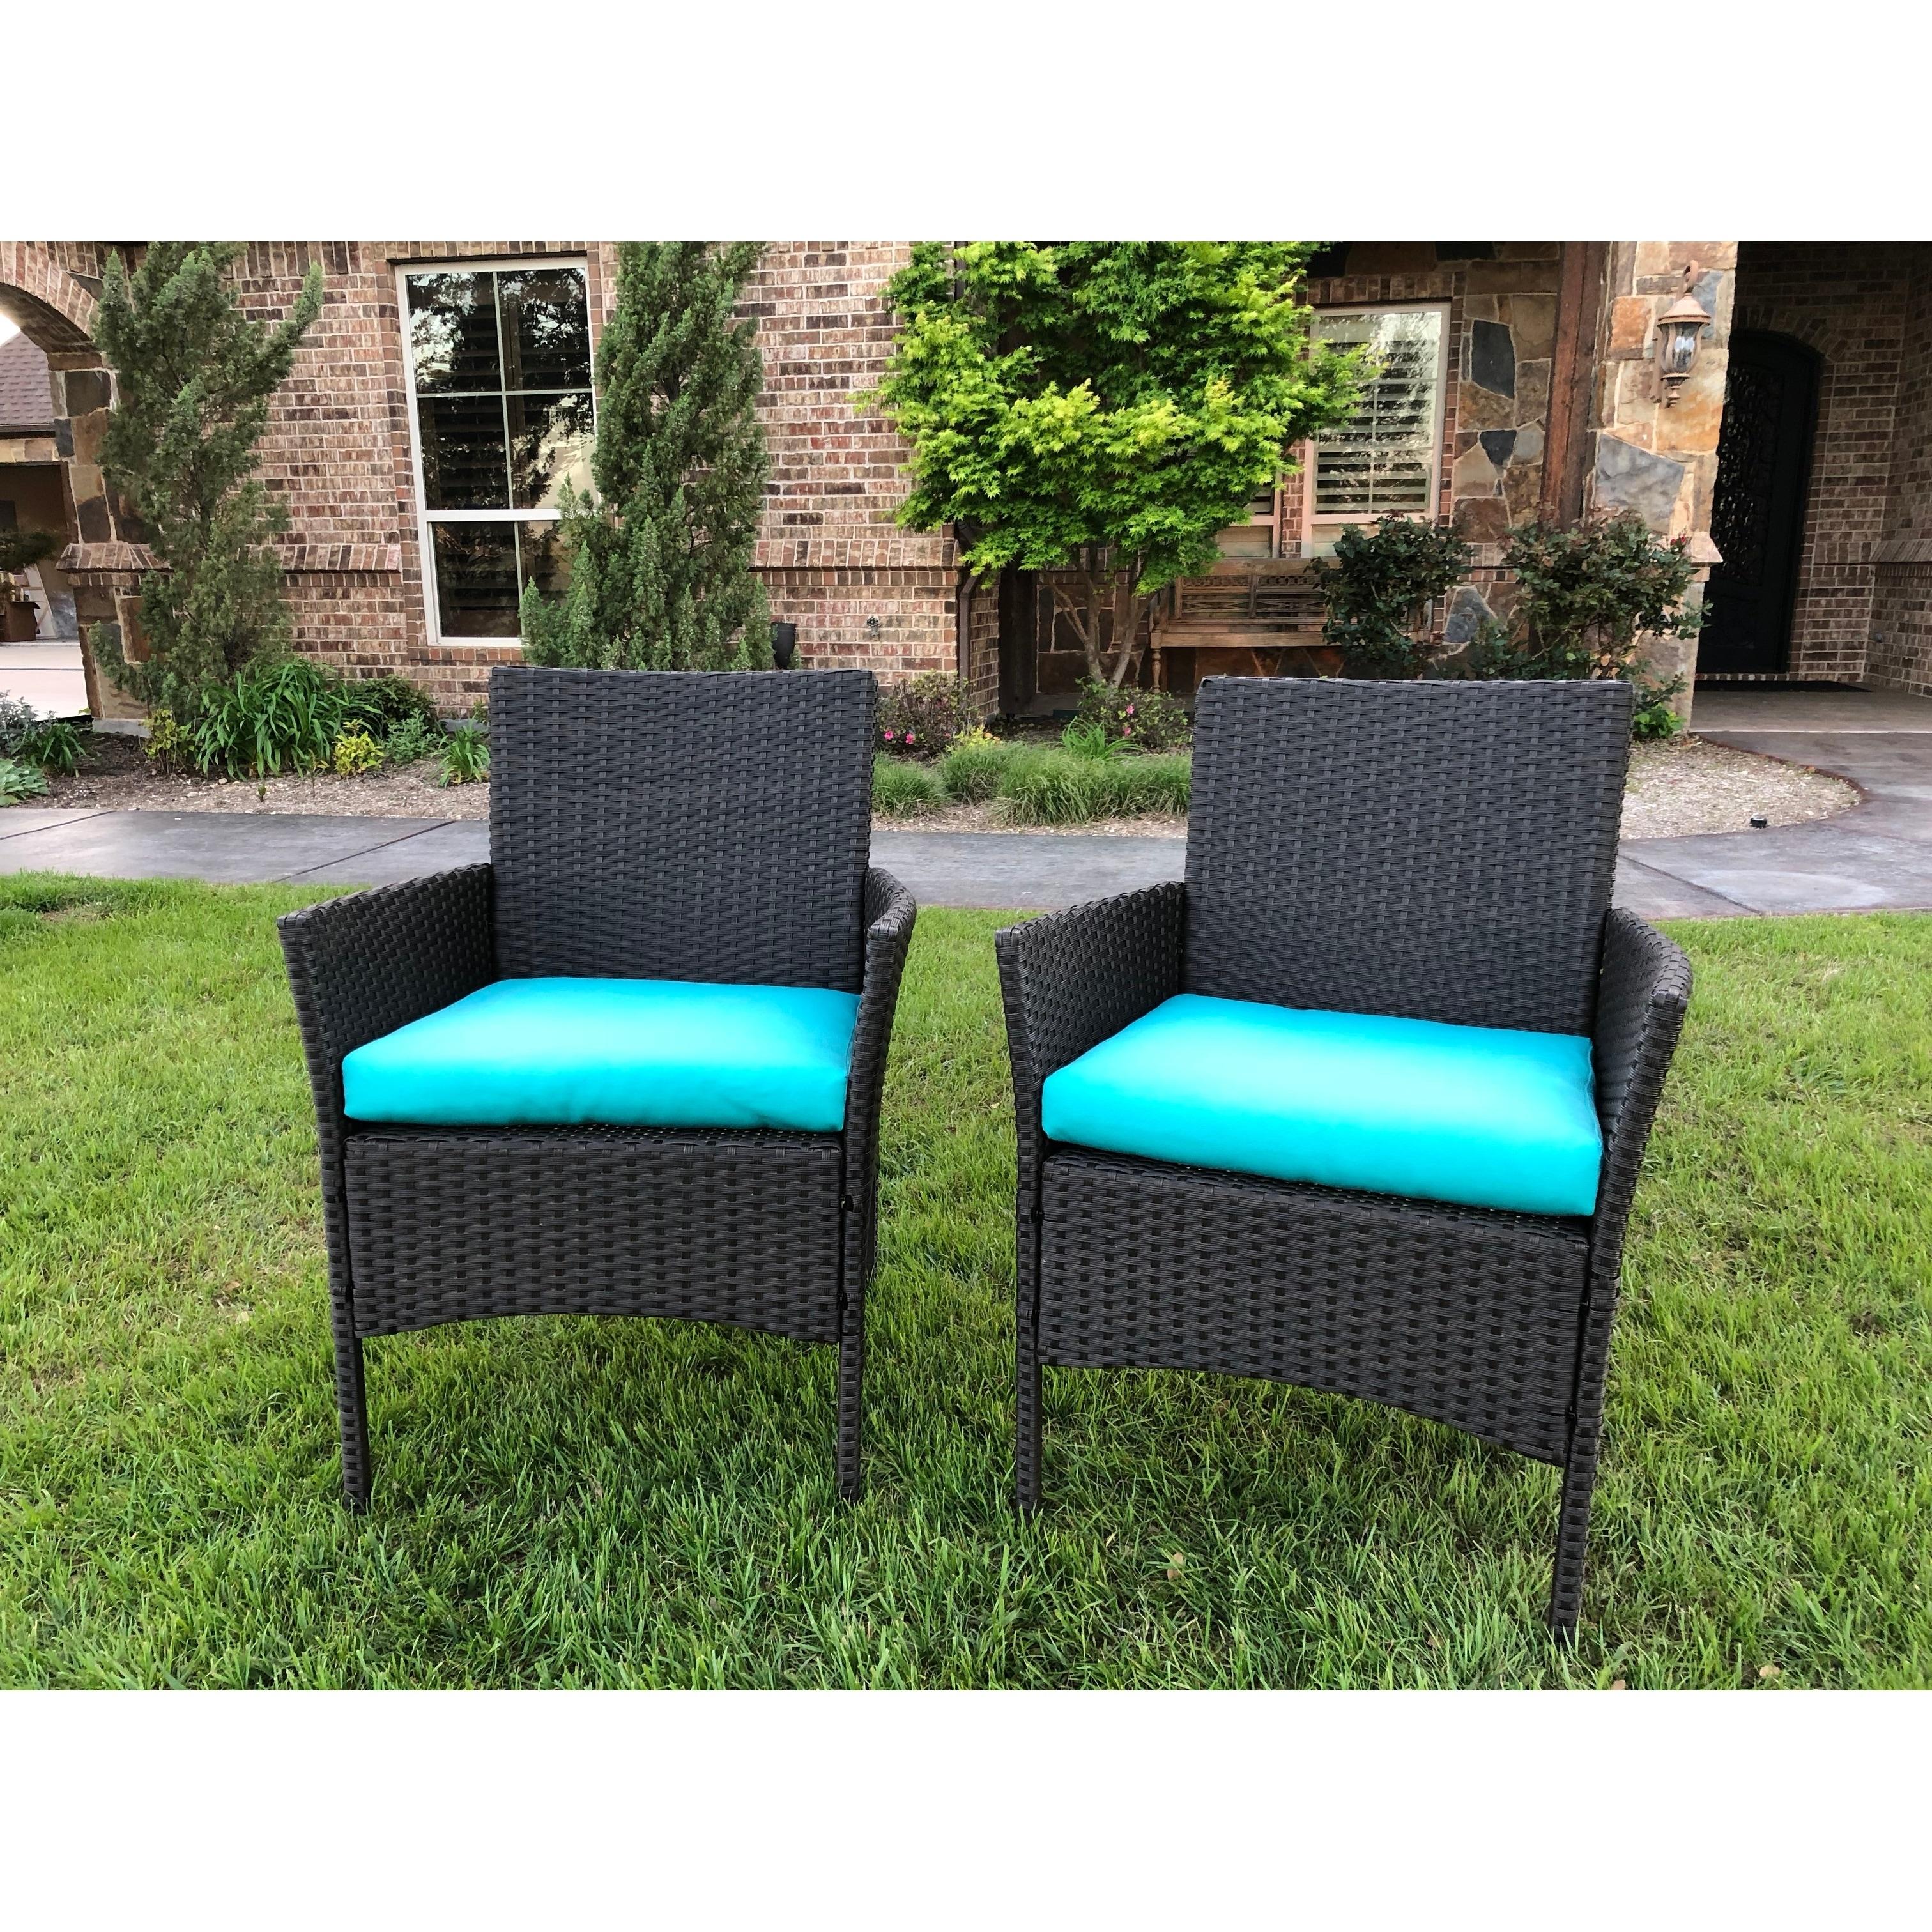 International Caravan Majorca Resin Wicker Patio Dining Chair Set Of 2 Overstock 28029470